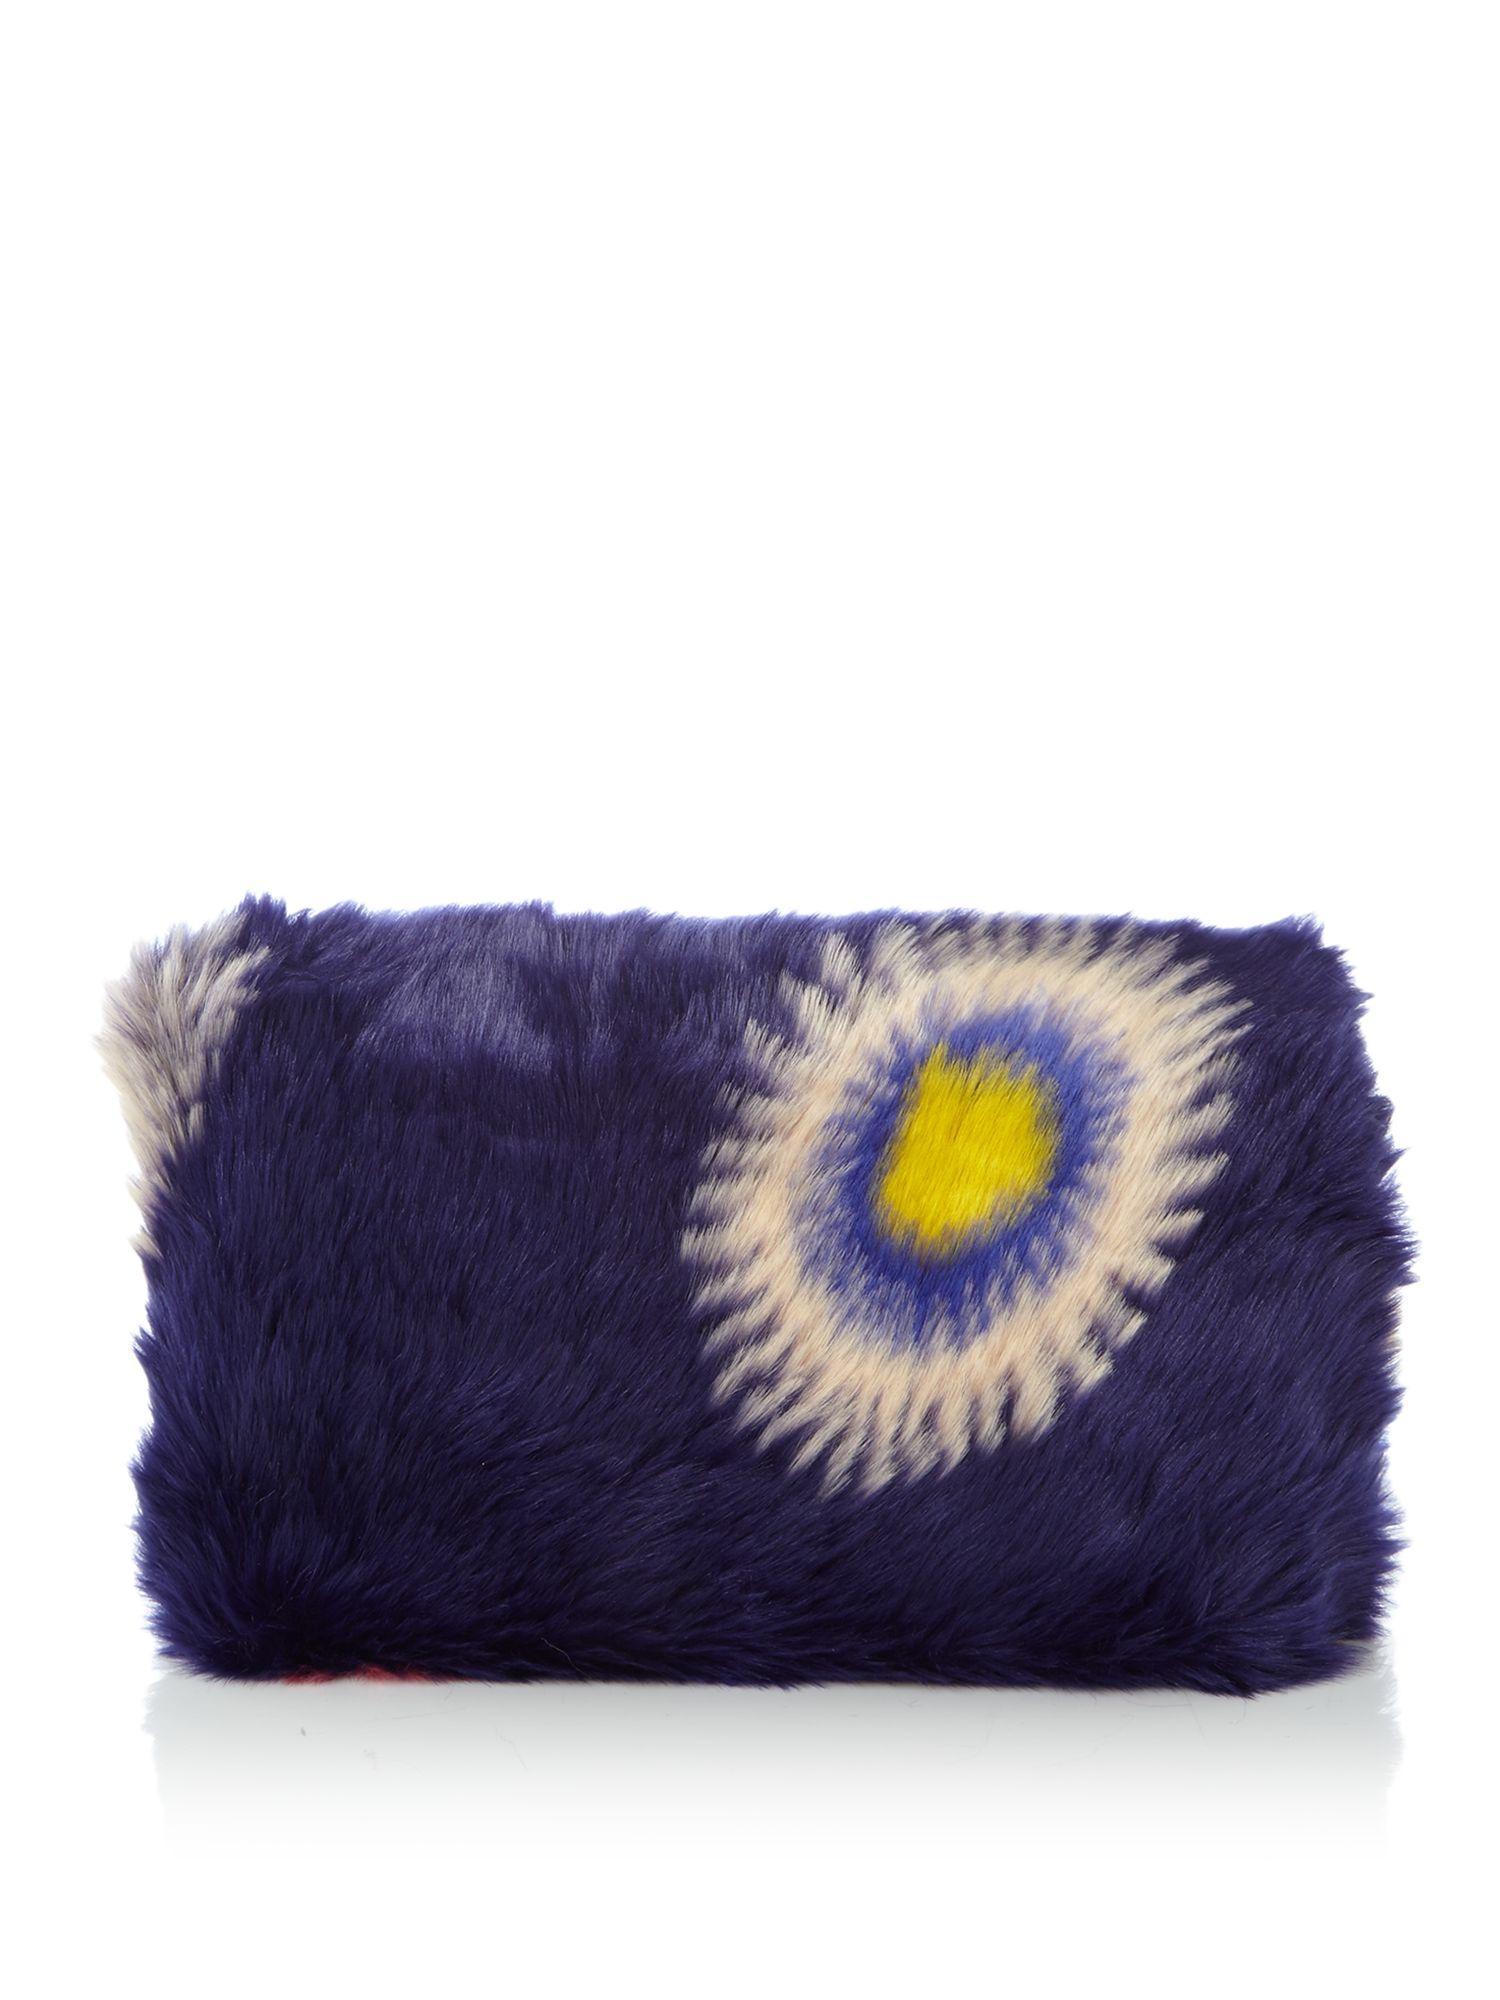 Paul Smith Pow Faux Fur Crossbody Clutch Bag in Navy (Blue)